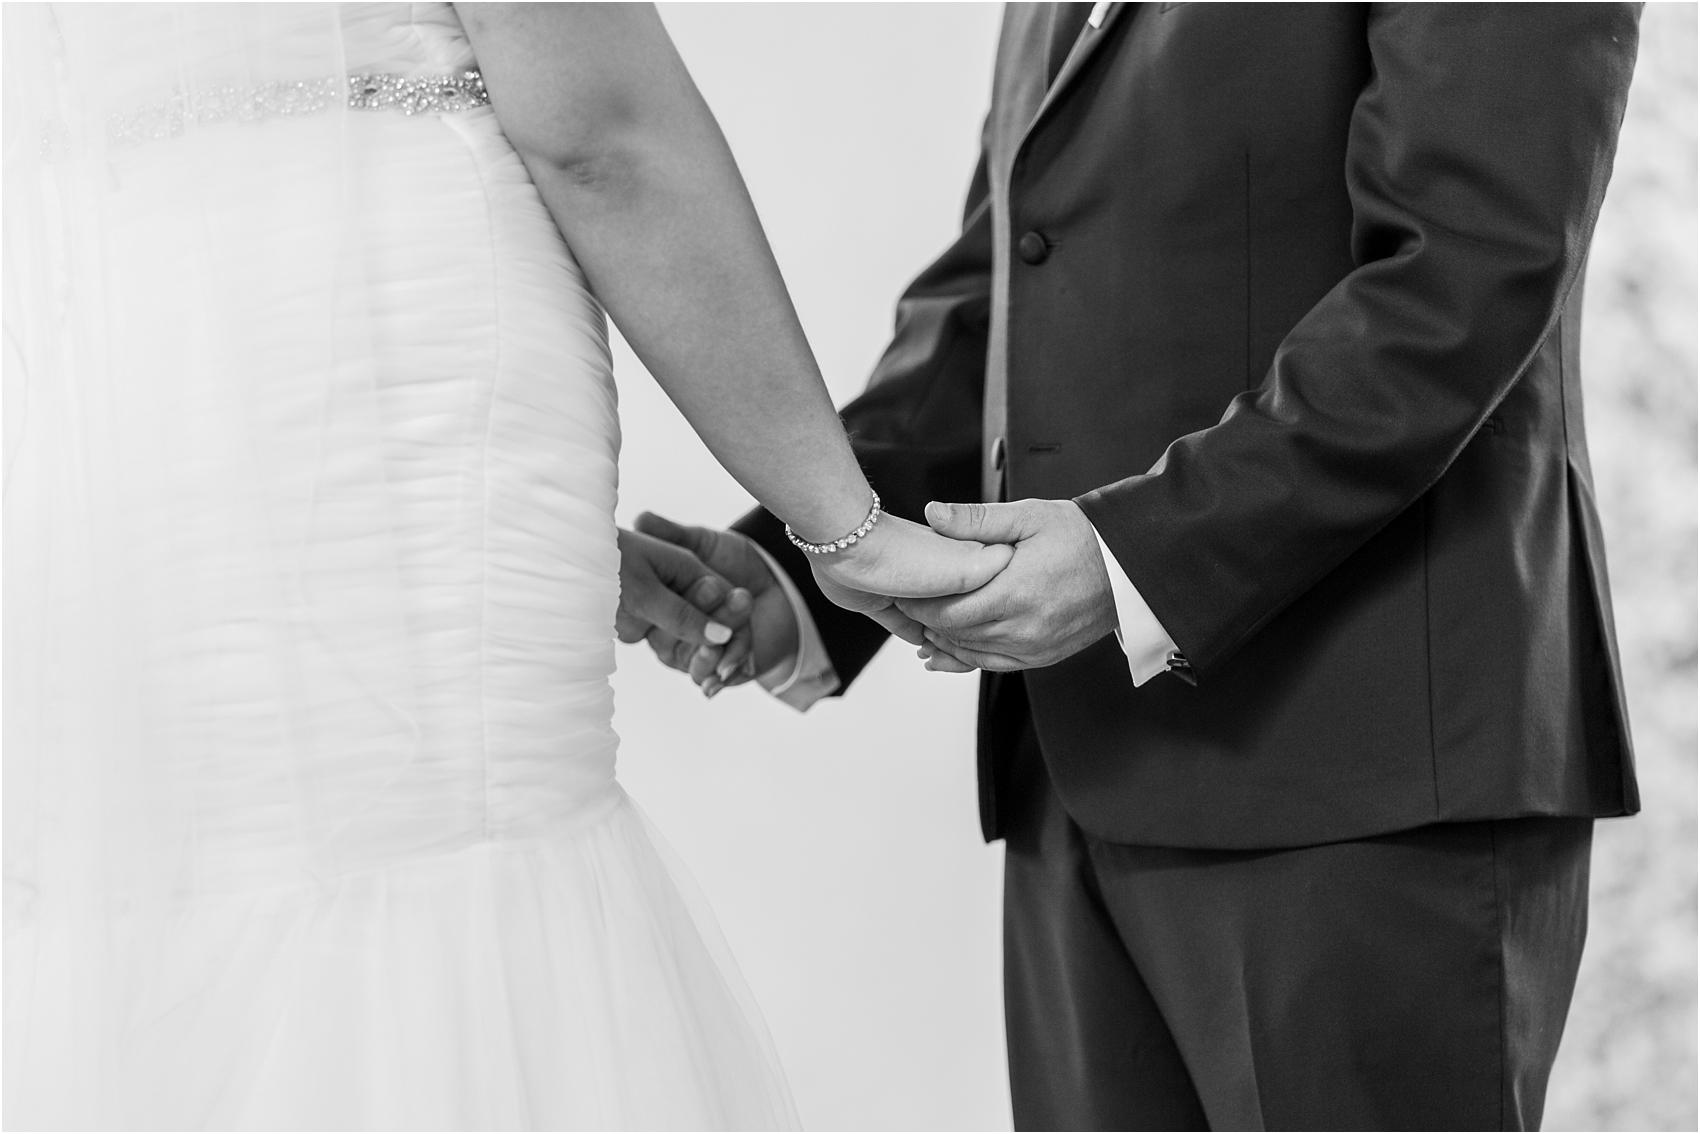 joyful-and-candid-navy-blush-wedding-photos-at-crystal-gardens-in-howell-mi-by-courtney-carolyn-photography_0038.jpg